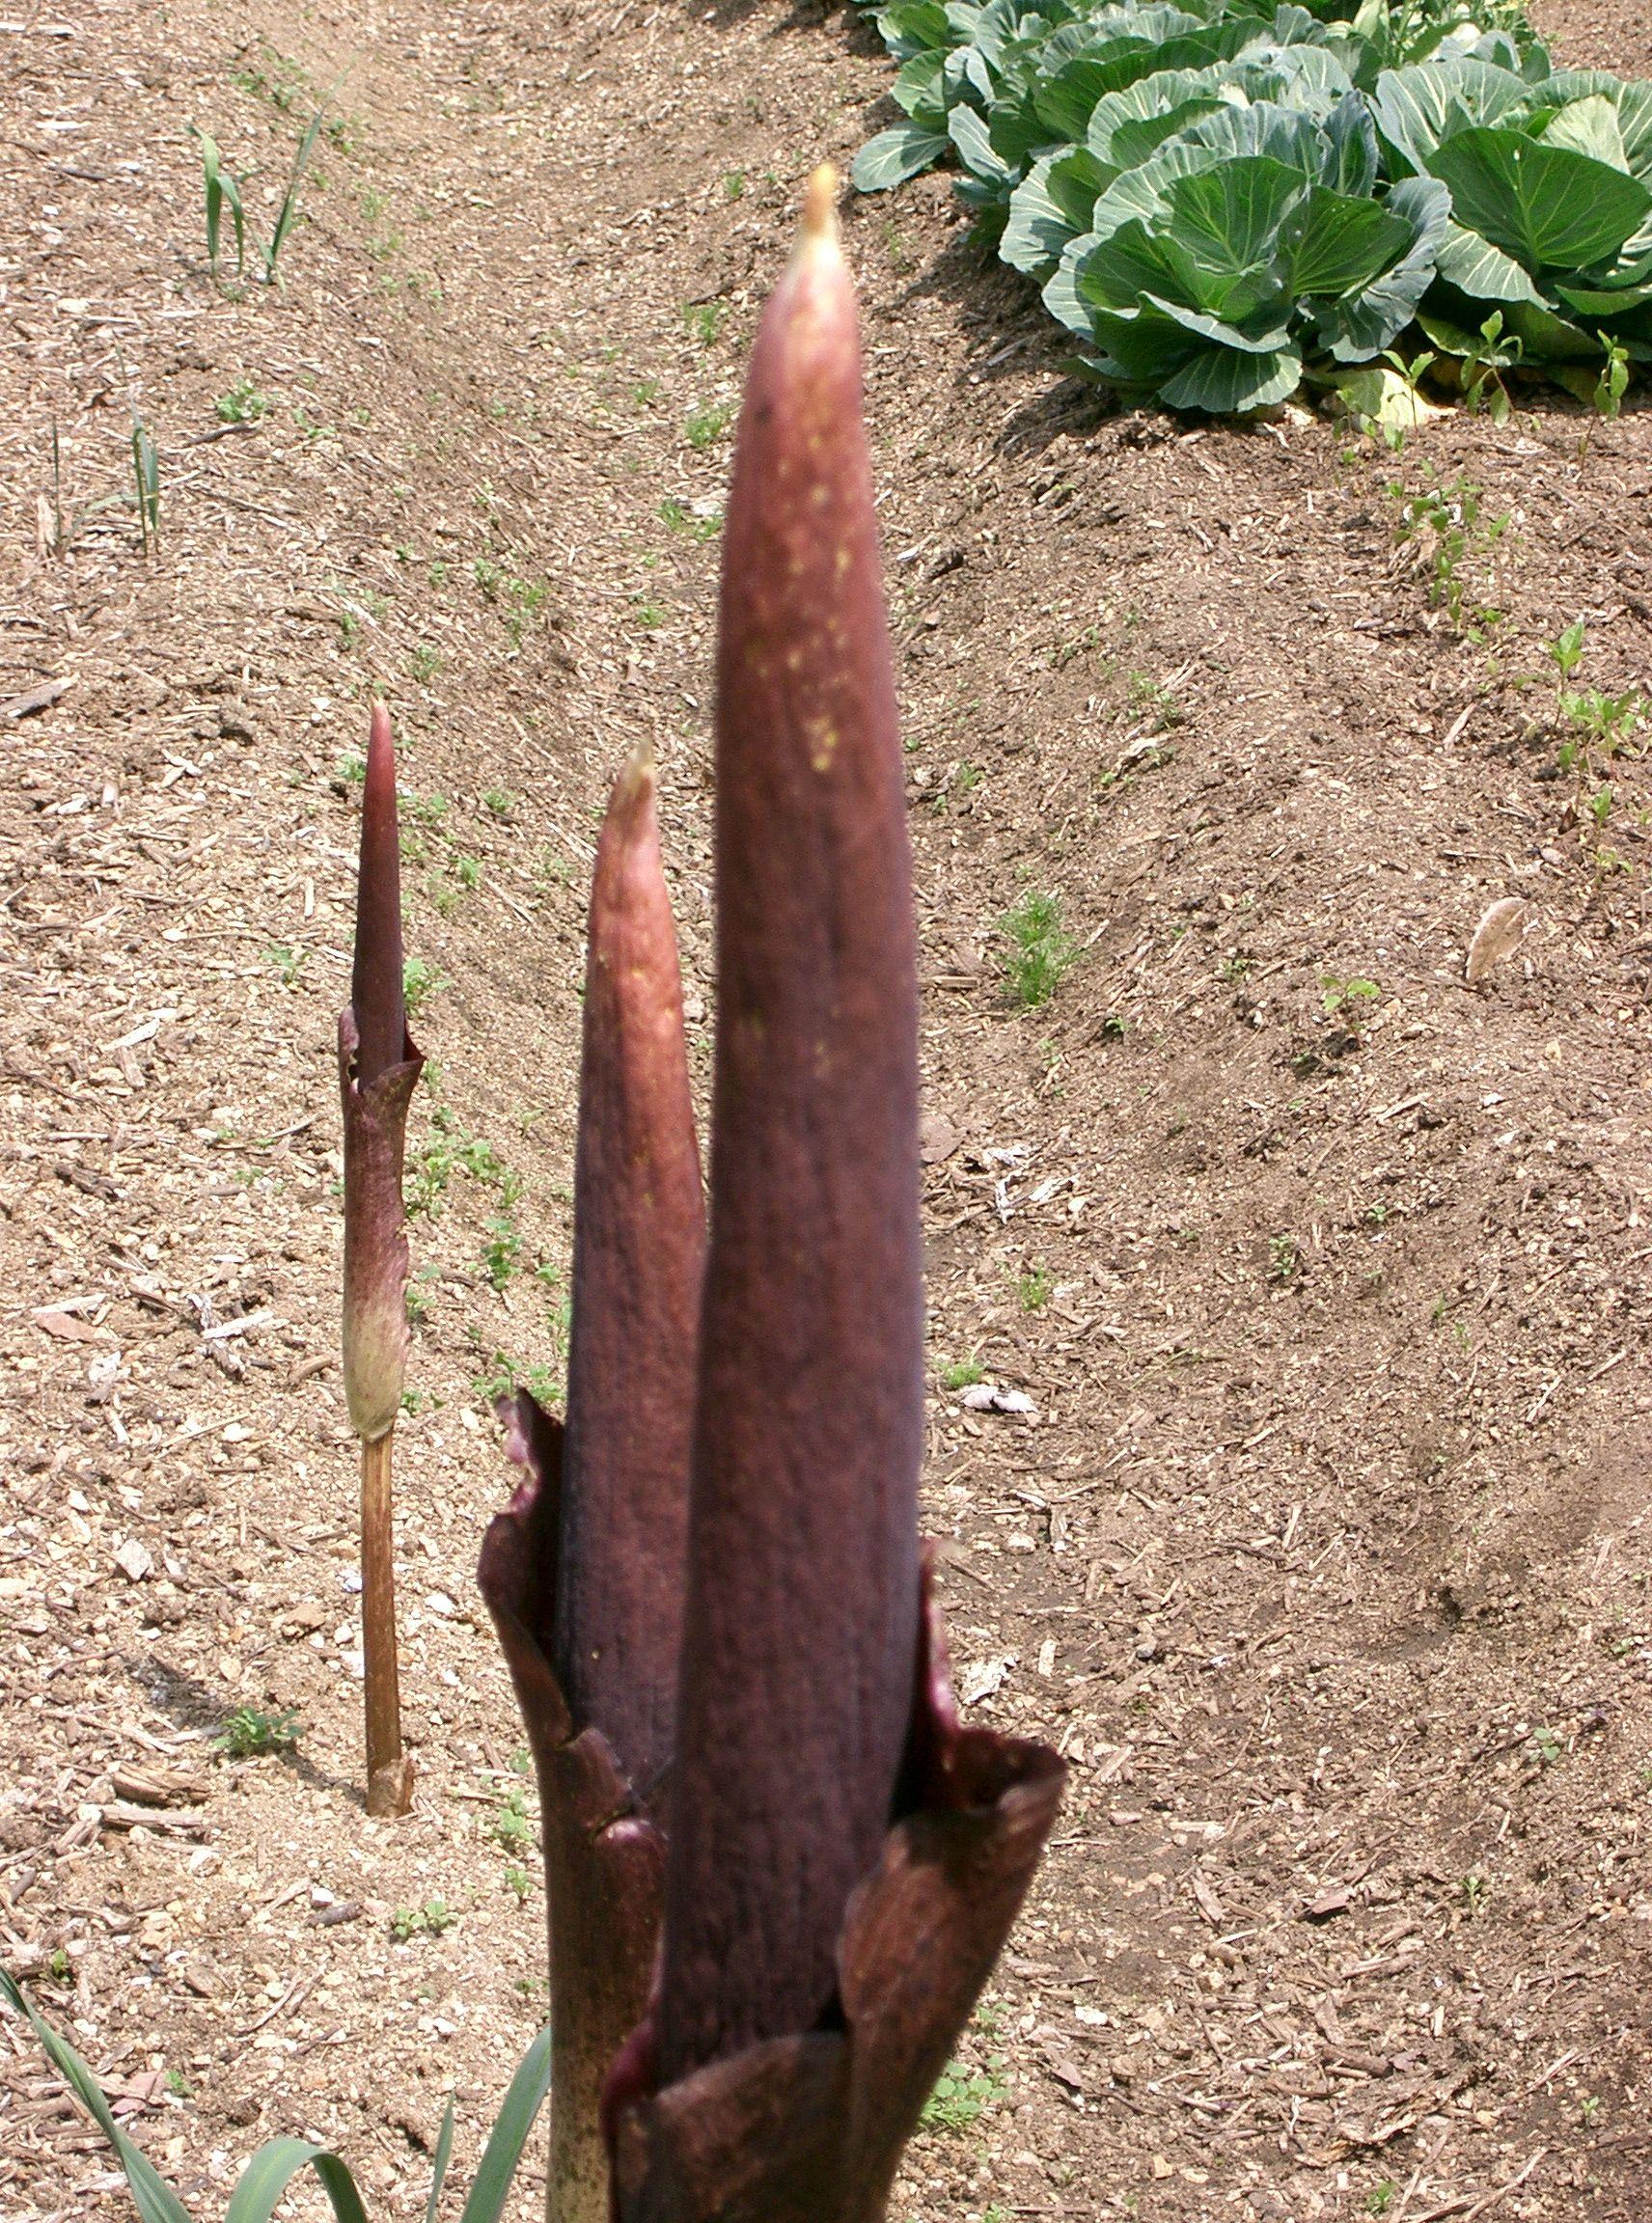 File:Amorphophallus konjac2.jpg - Wikimedia Commons